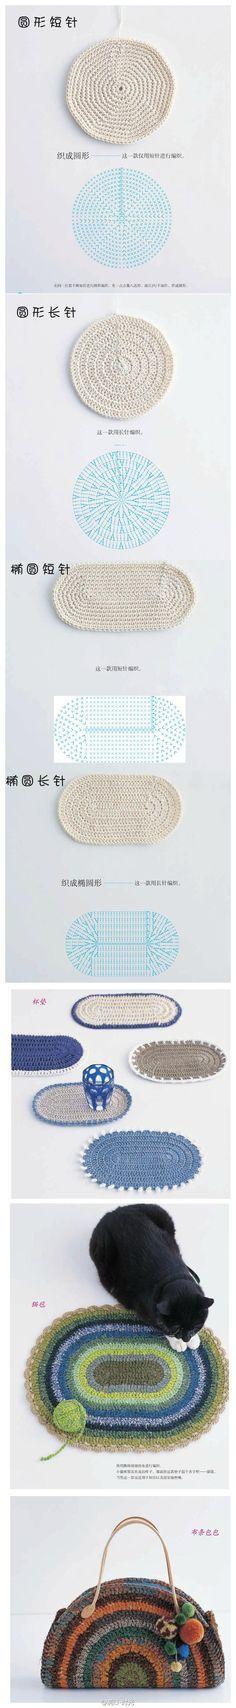 Crochet shapes